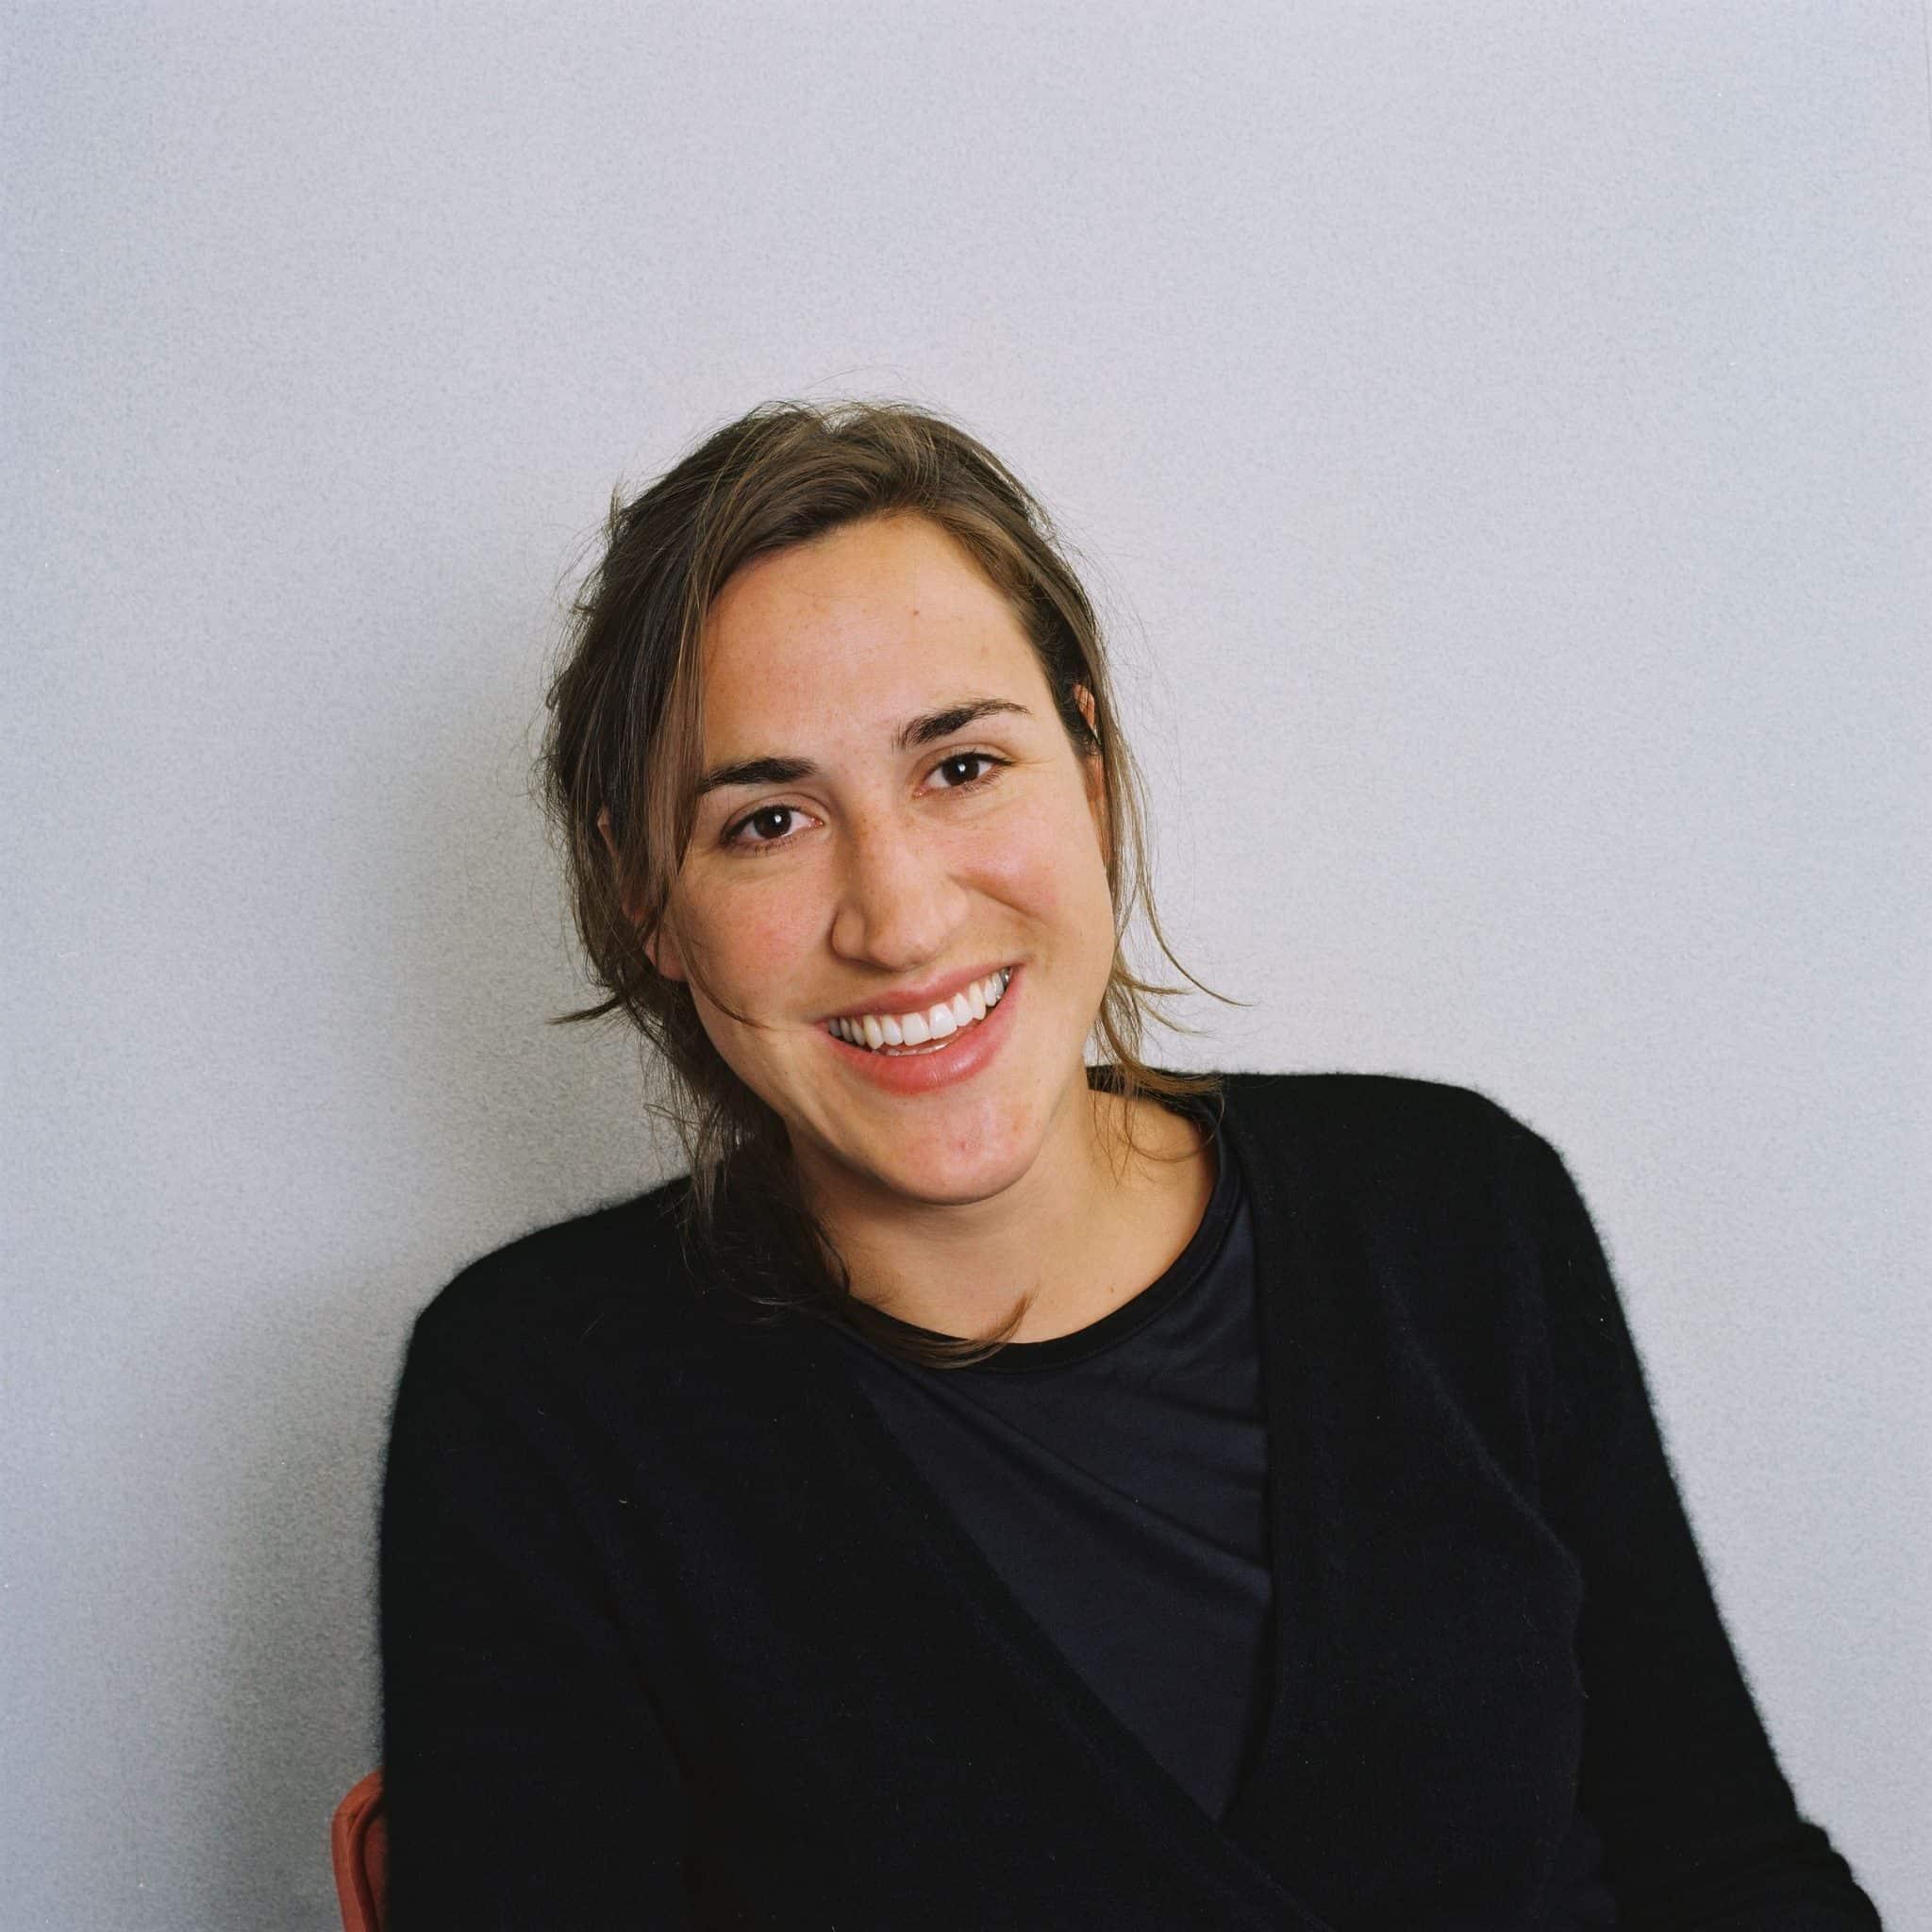 Nathalie Rey